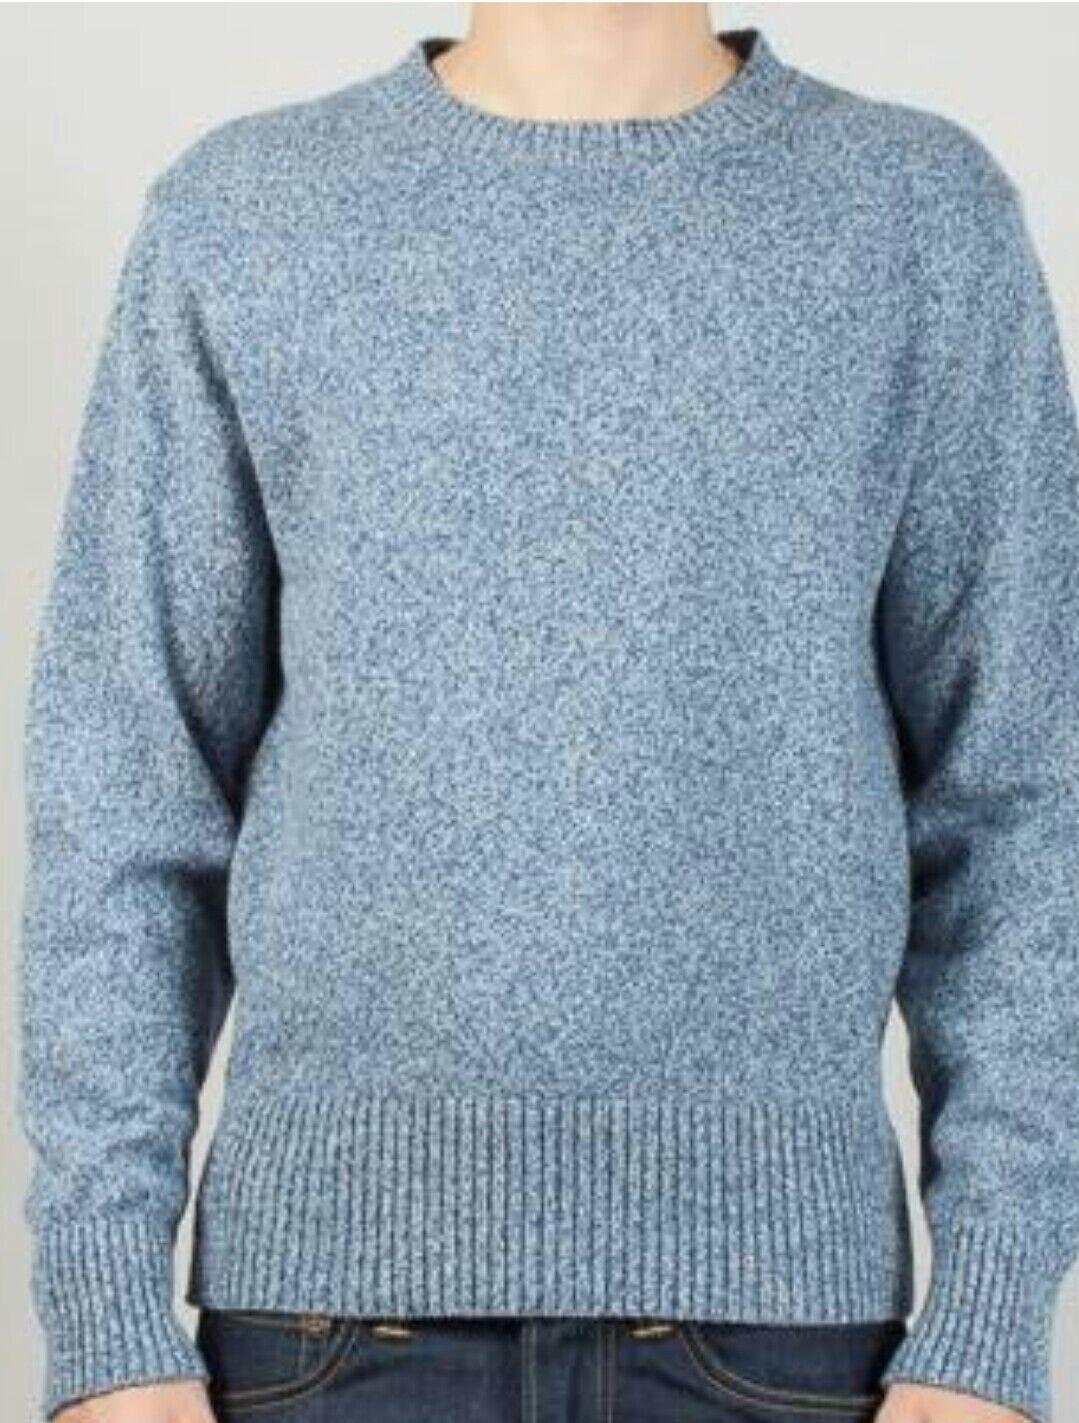 Universal Works Chunky Crew Melange Cotton Blau Sweater Größe XL BNWT